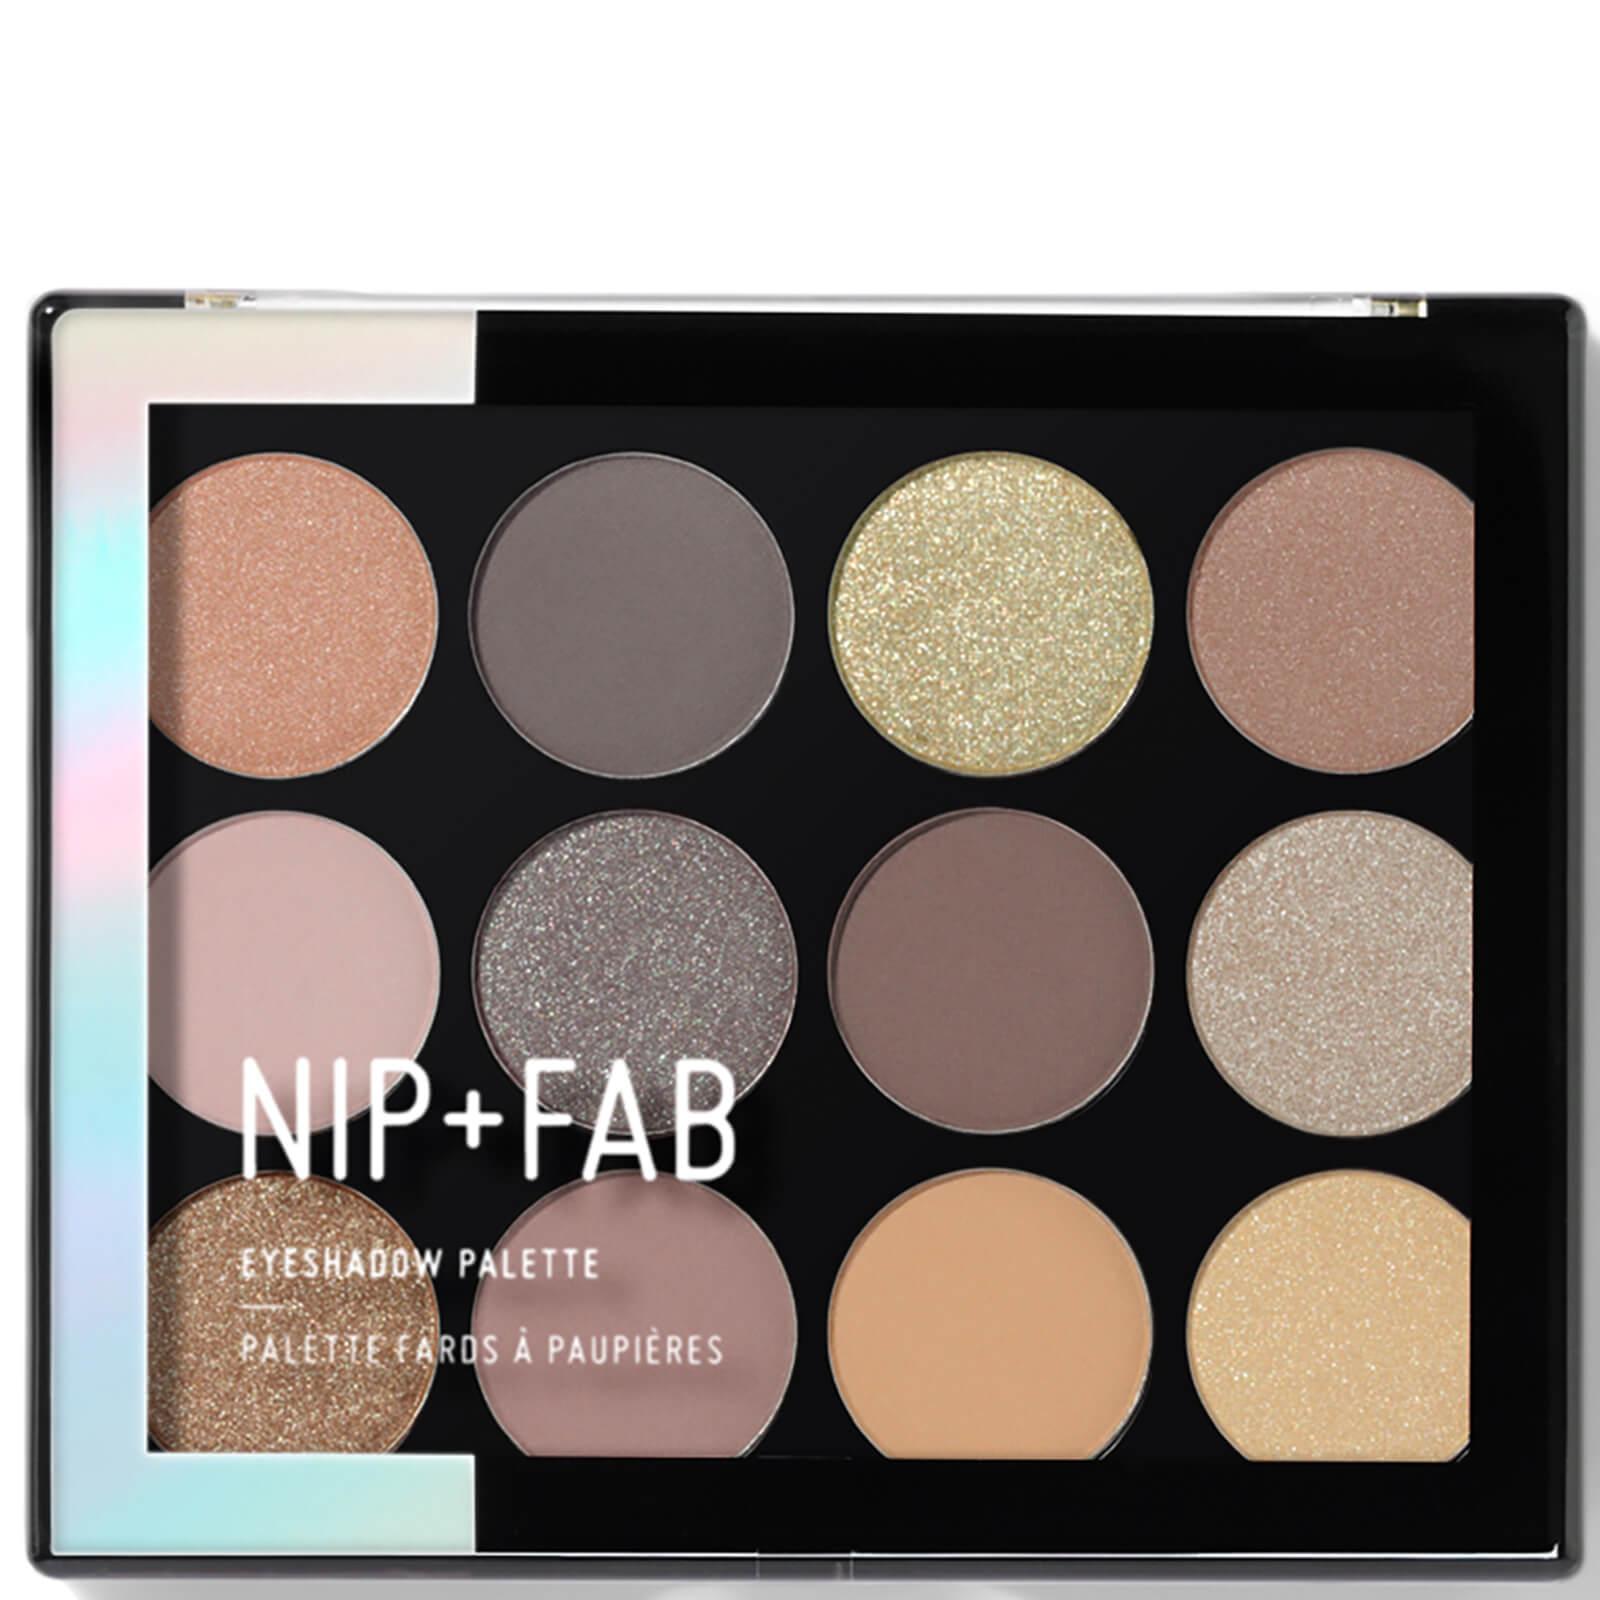 Nip+fab NIP + FAB Make Up palette di ombretti - Cool Neutrals 12 g